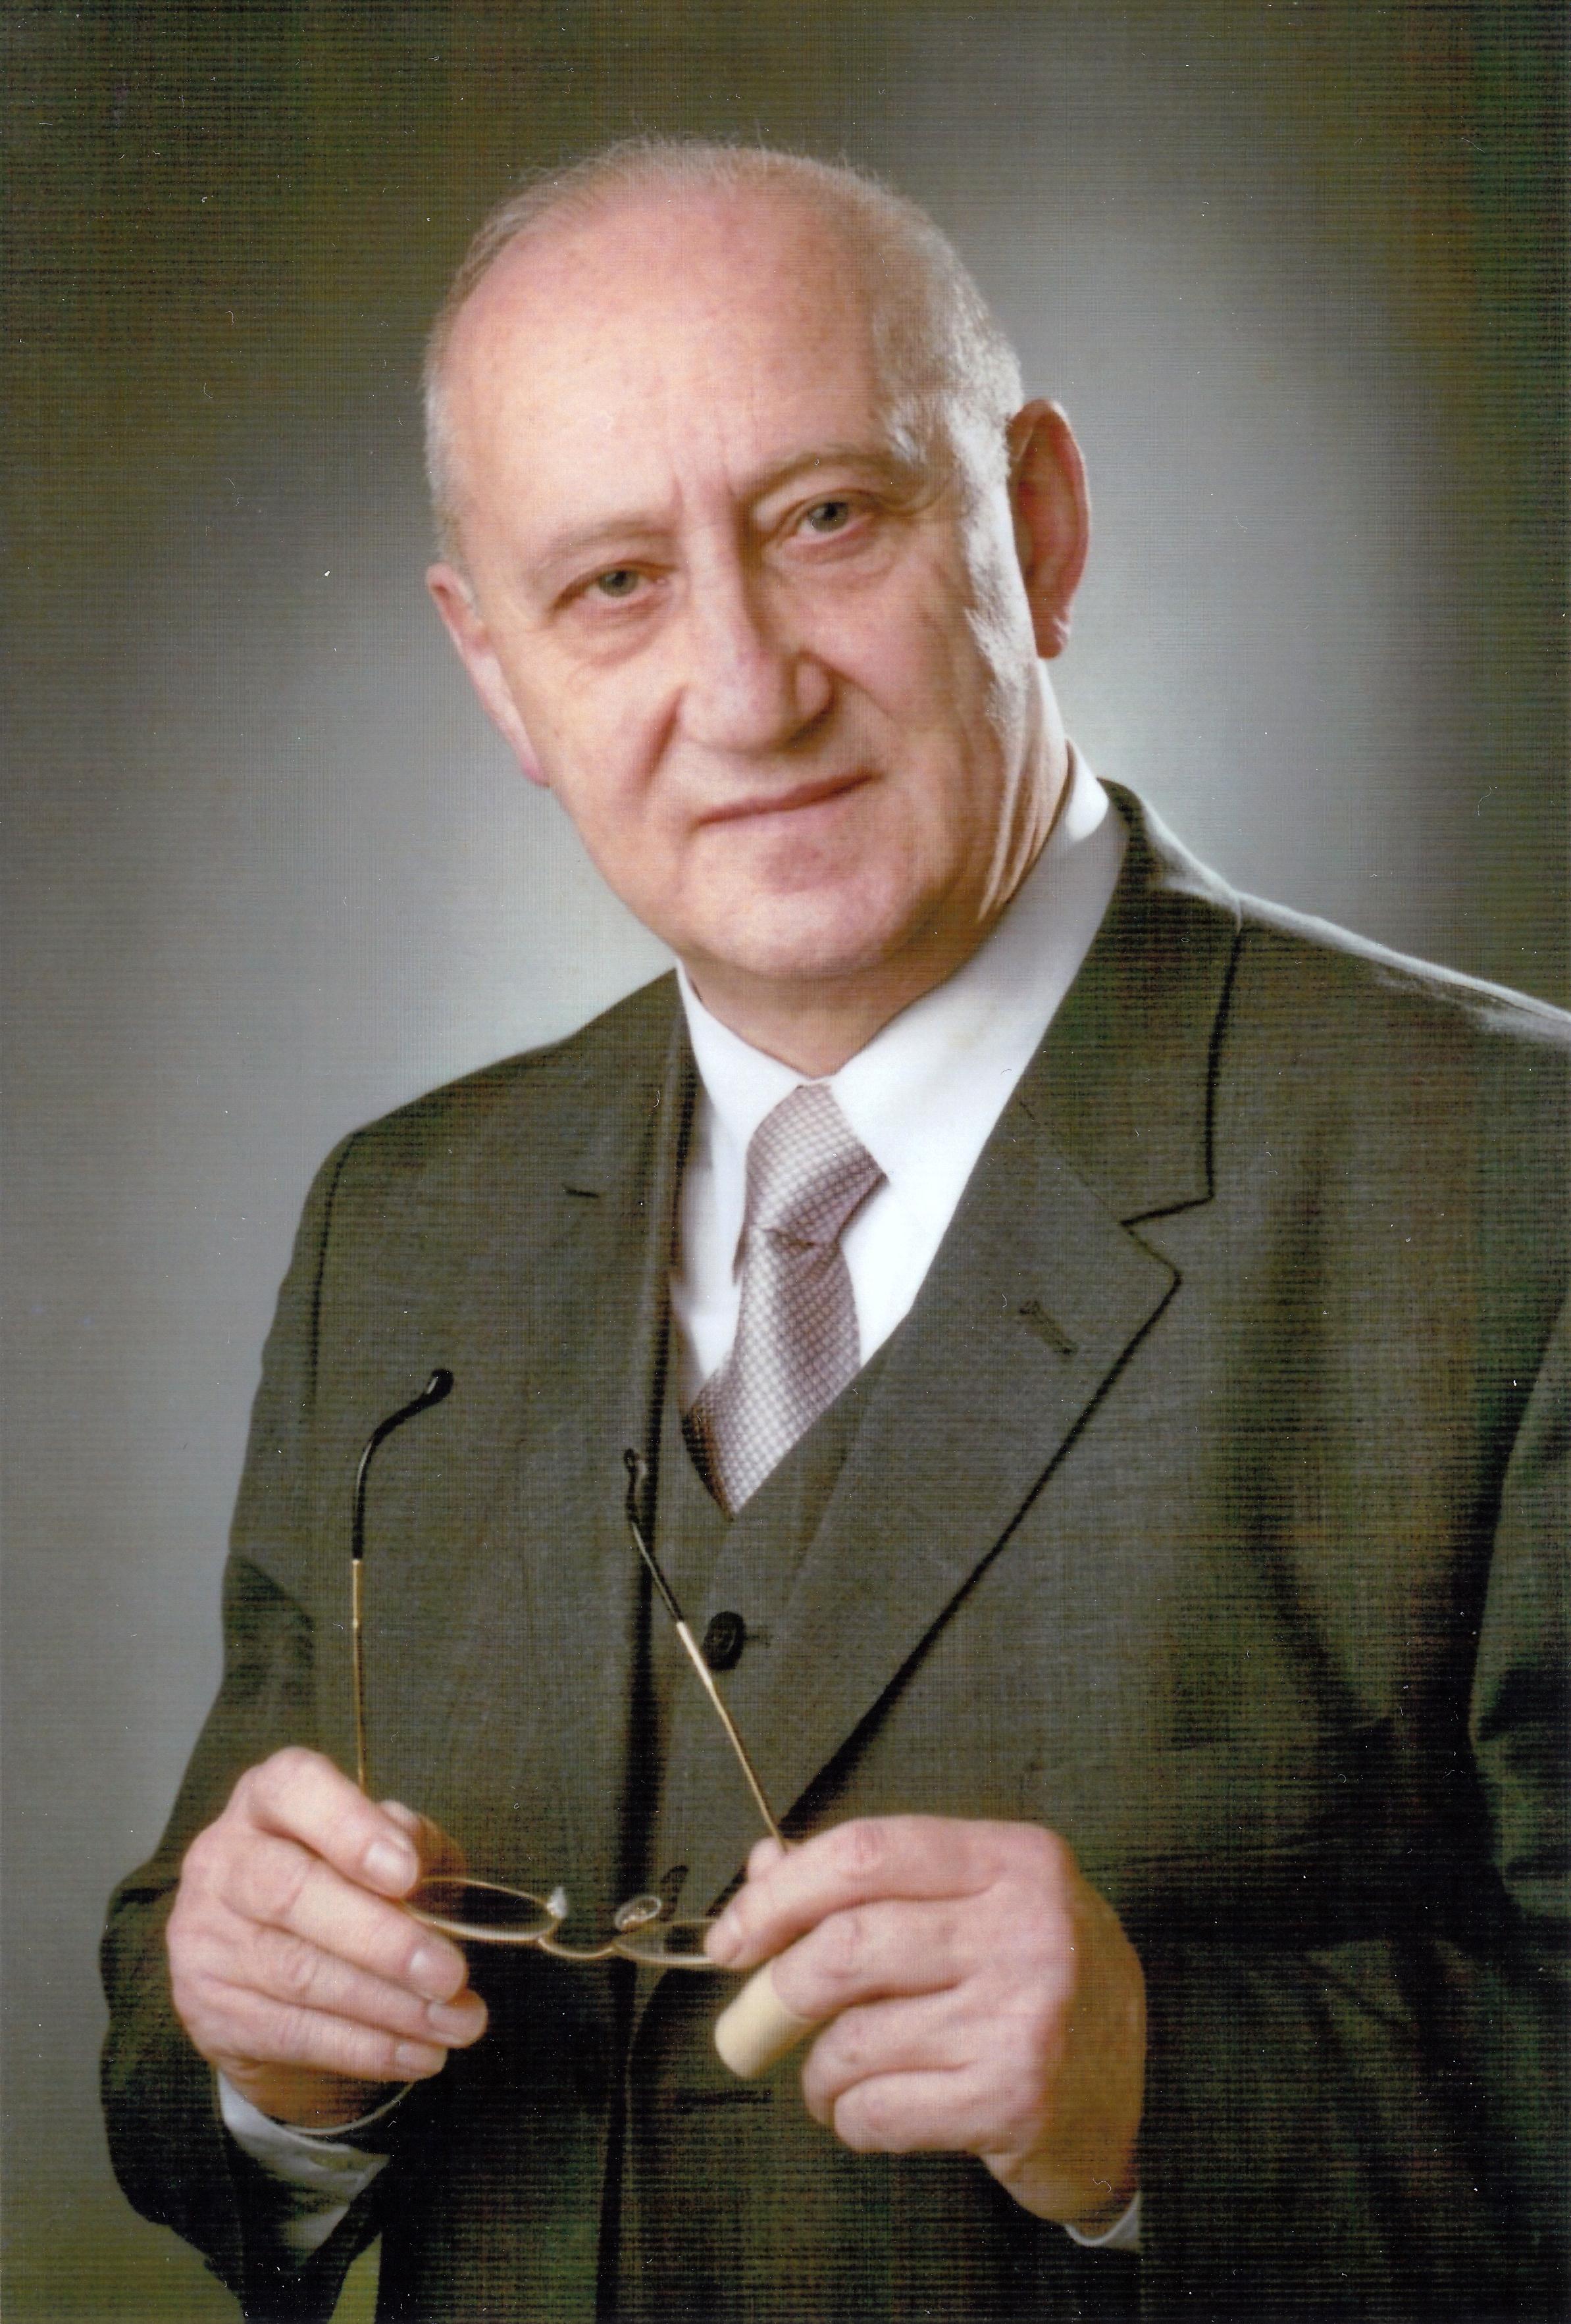 Hainz Josef